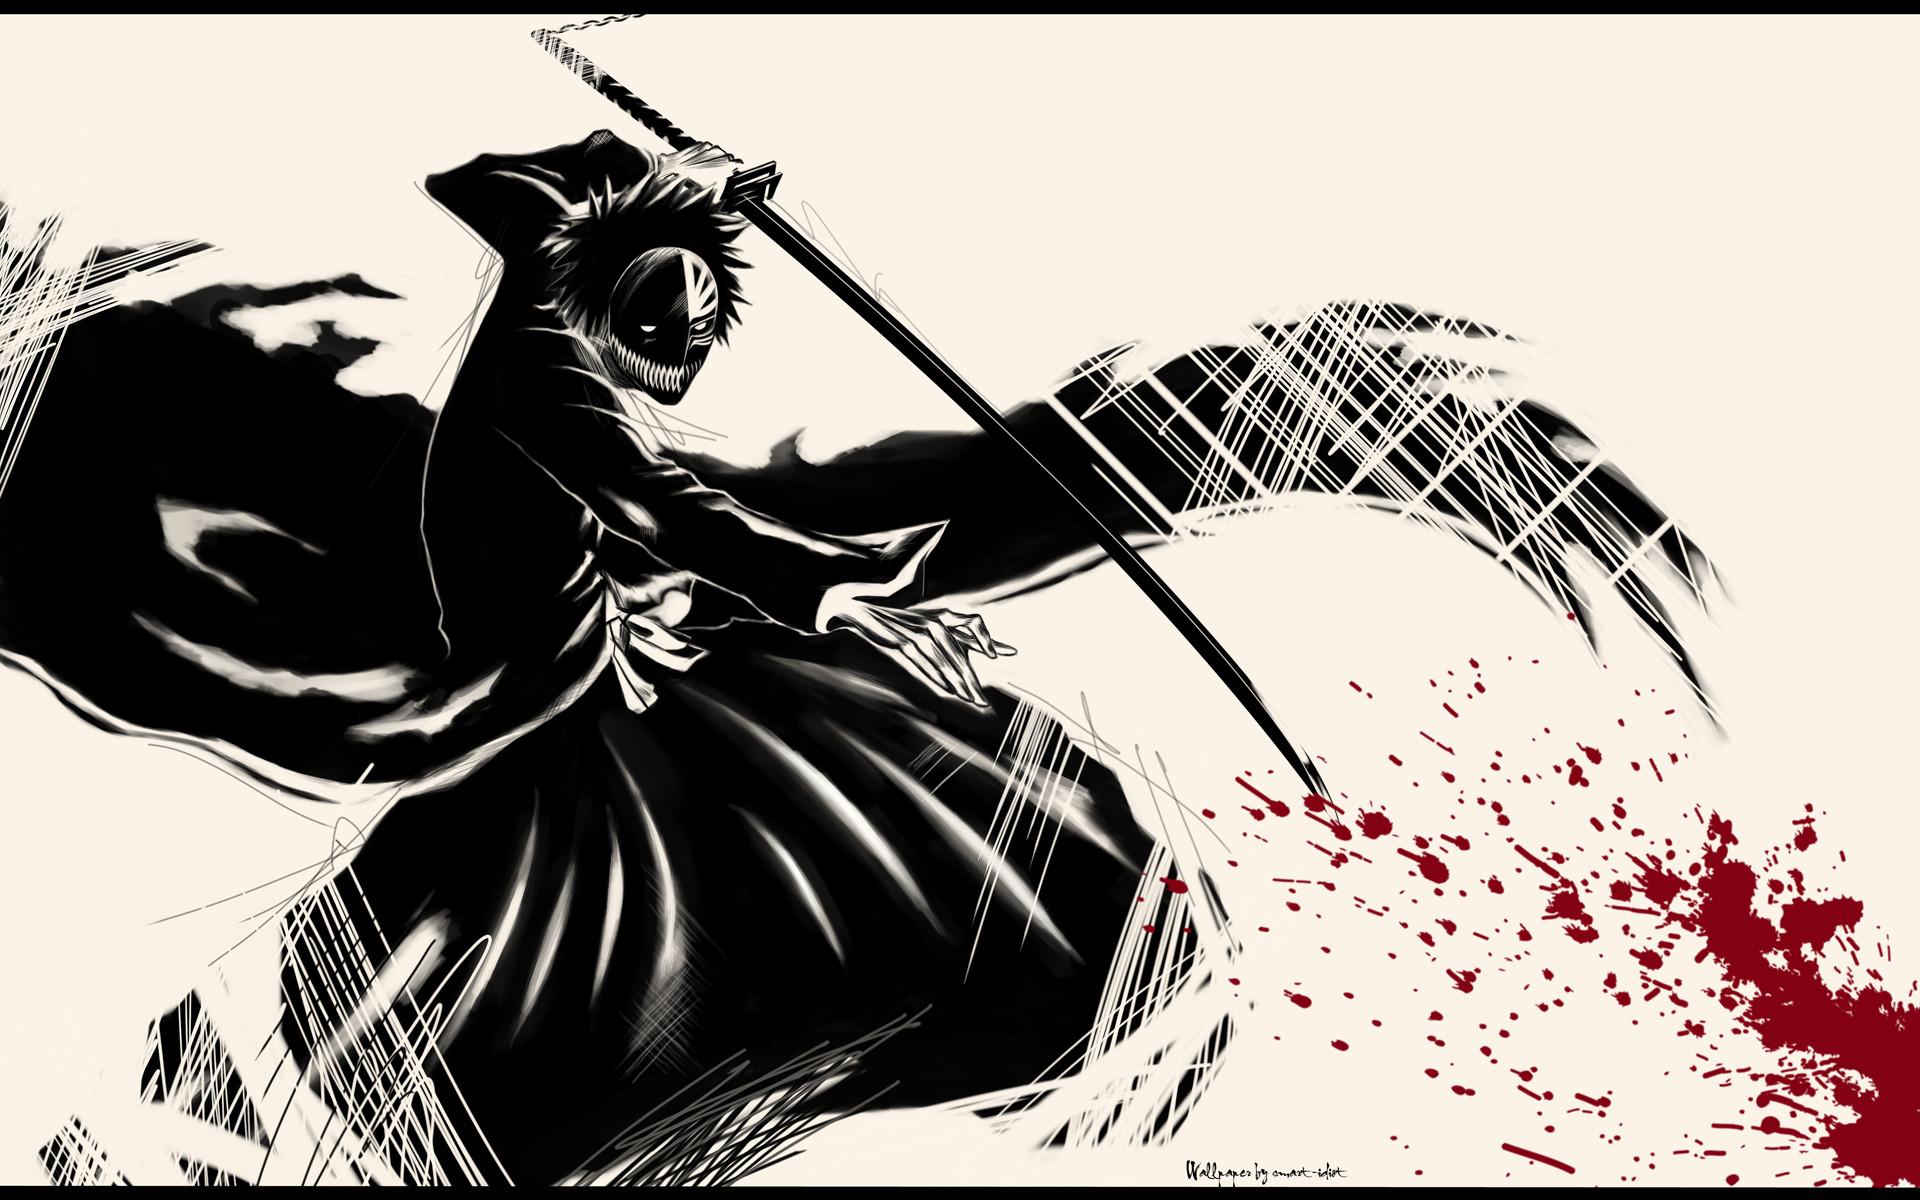 1920x1080 Bleach Espada Wallpapers